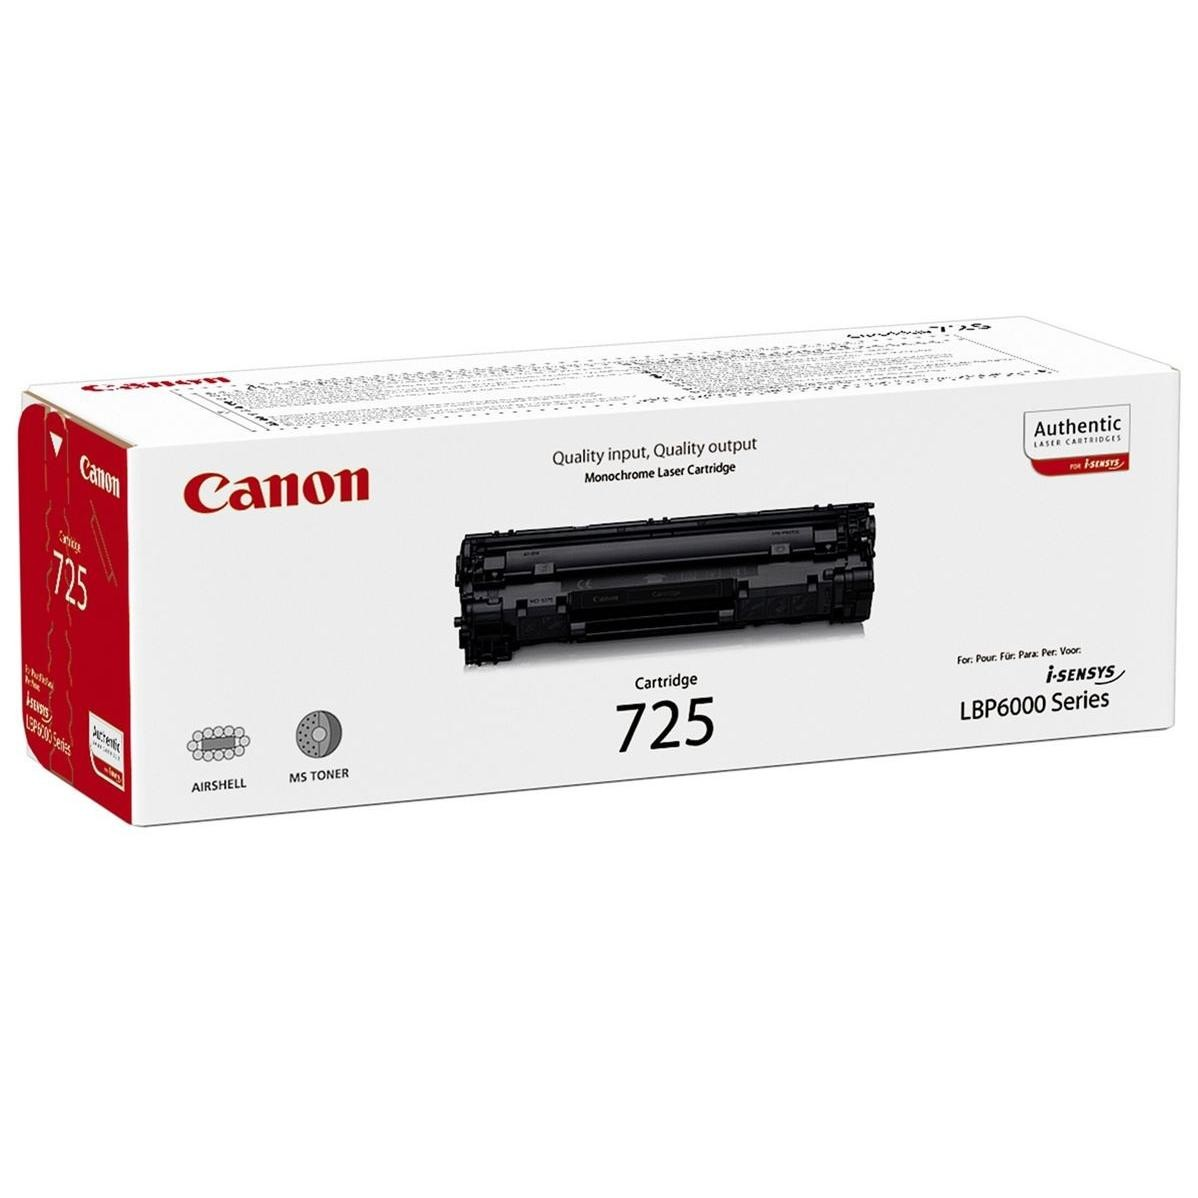 Toner Canon CRG-725Bk, 3484B002, originálny (Čierny)